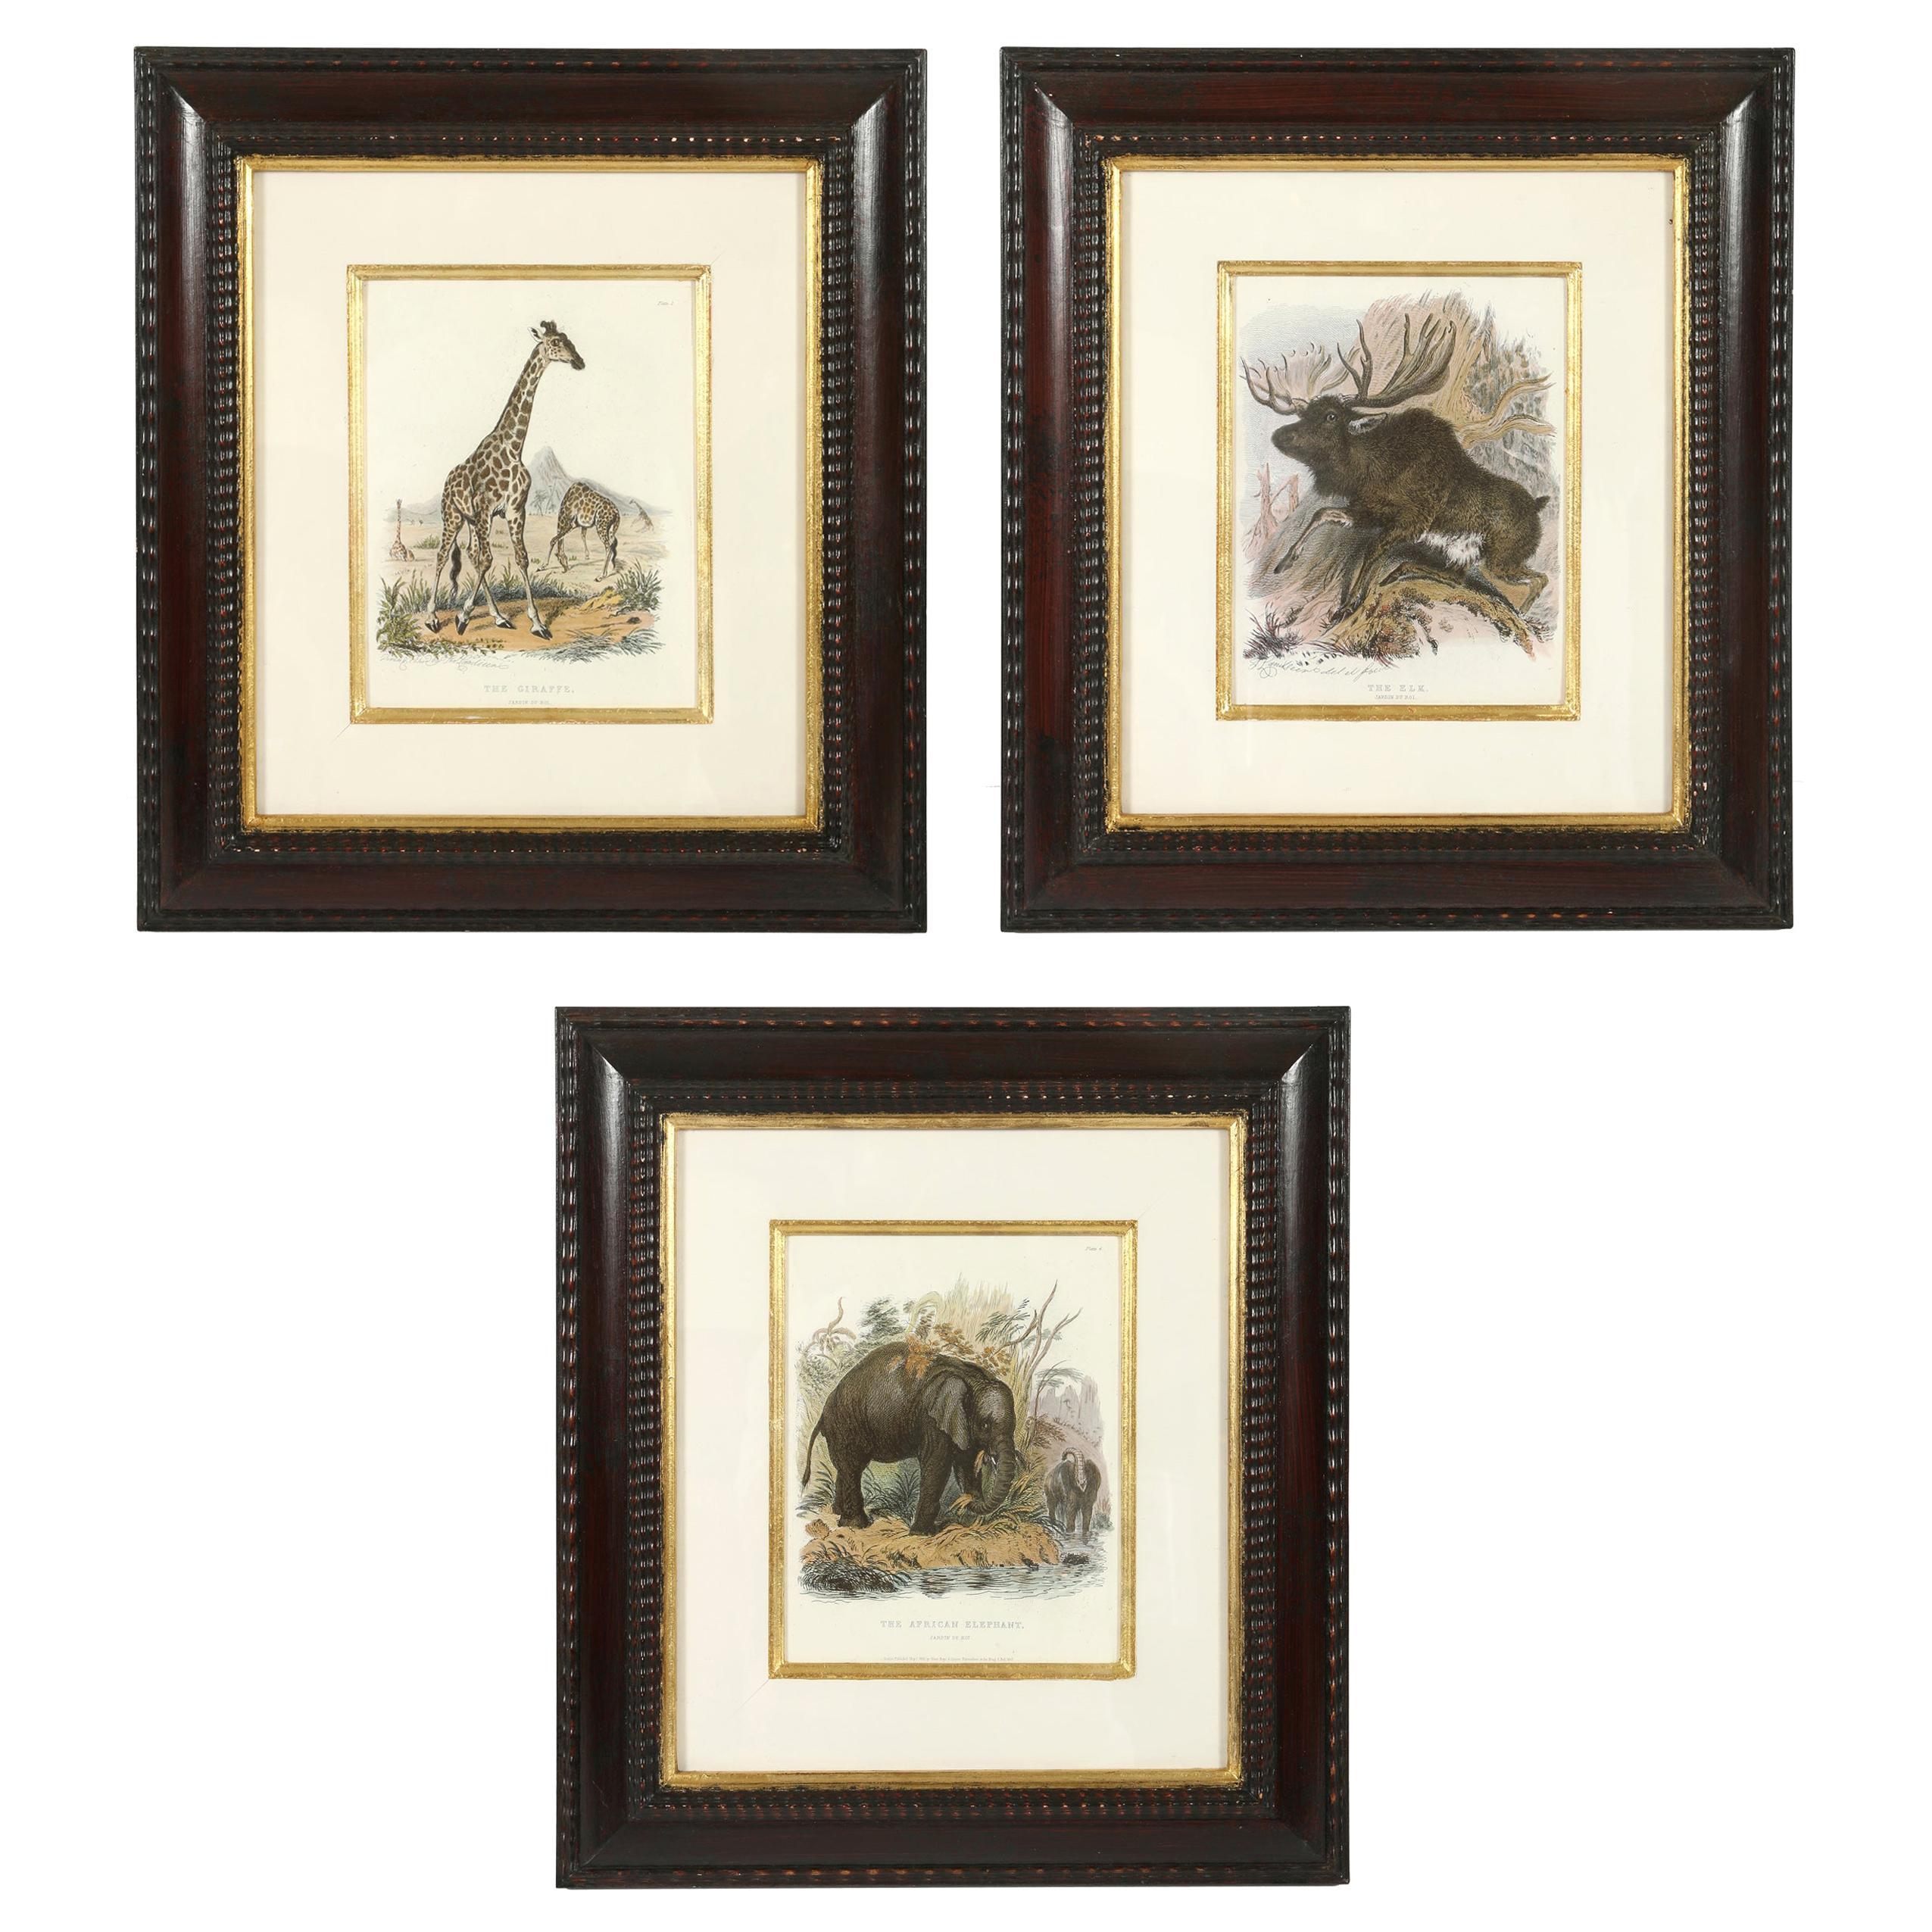 Set of Three Animal Prints in Mahogany Frames